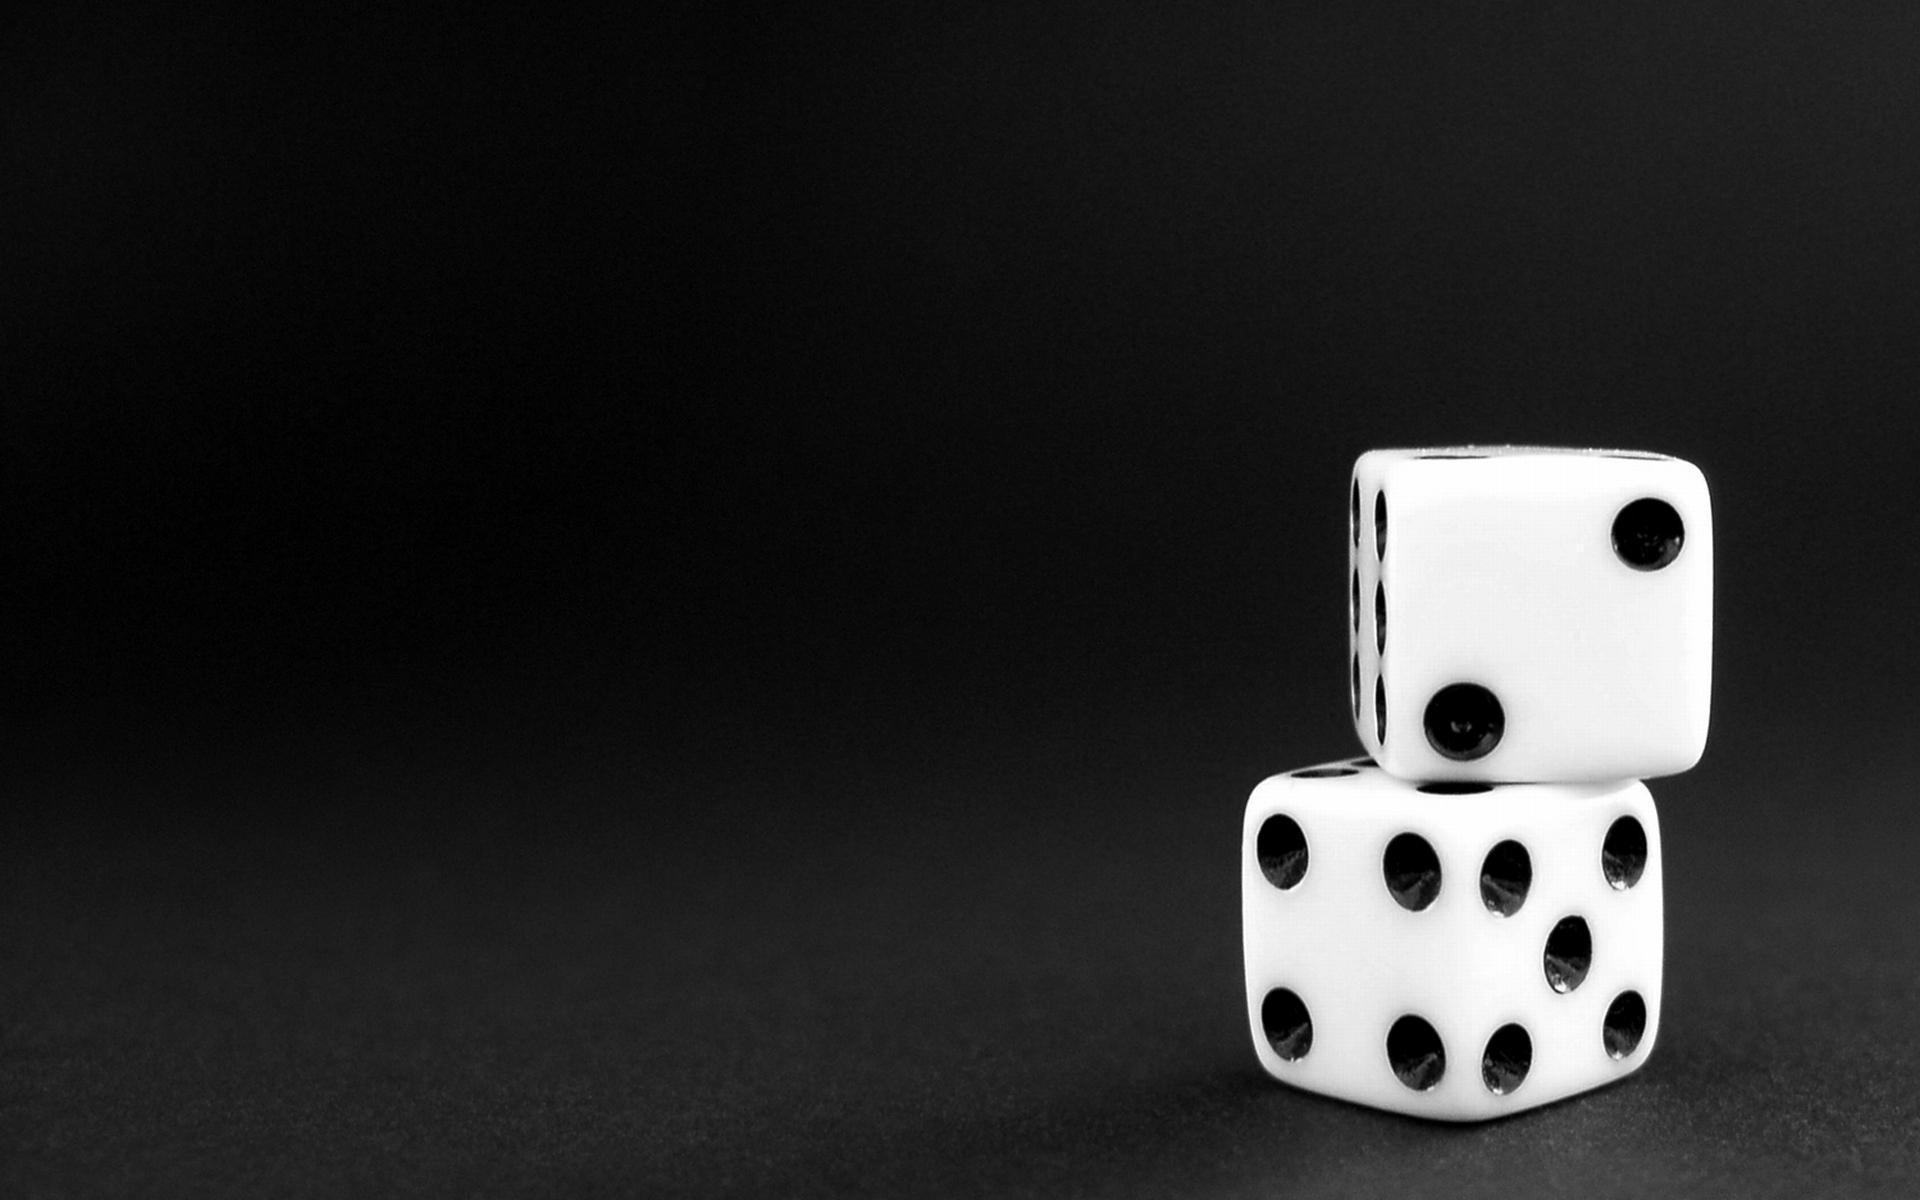 pkr poker download pc